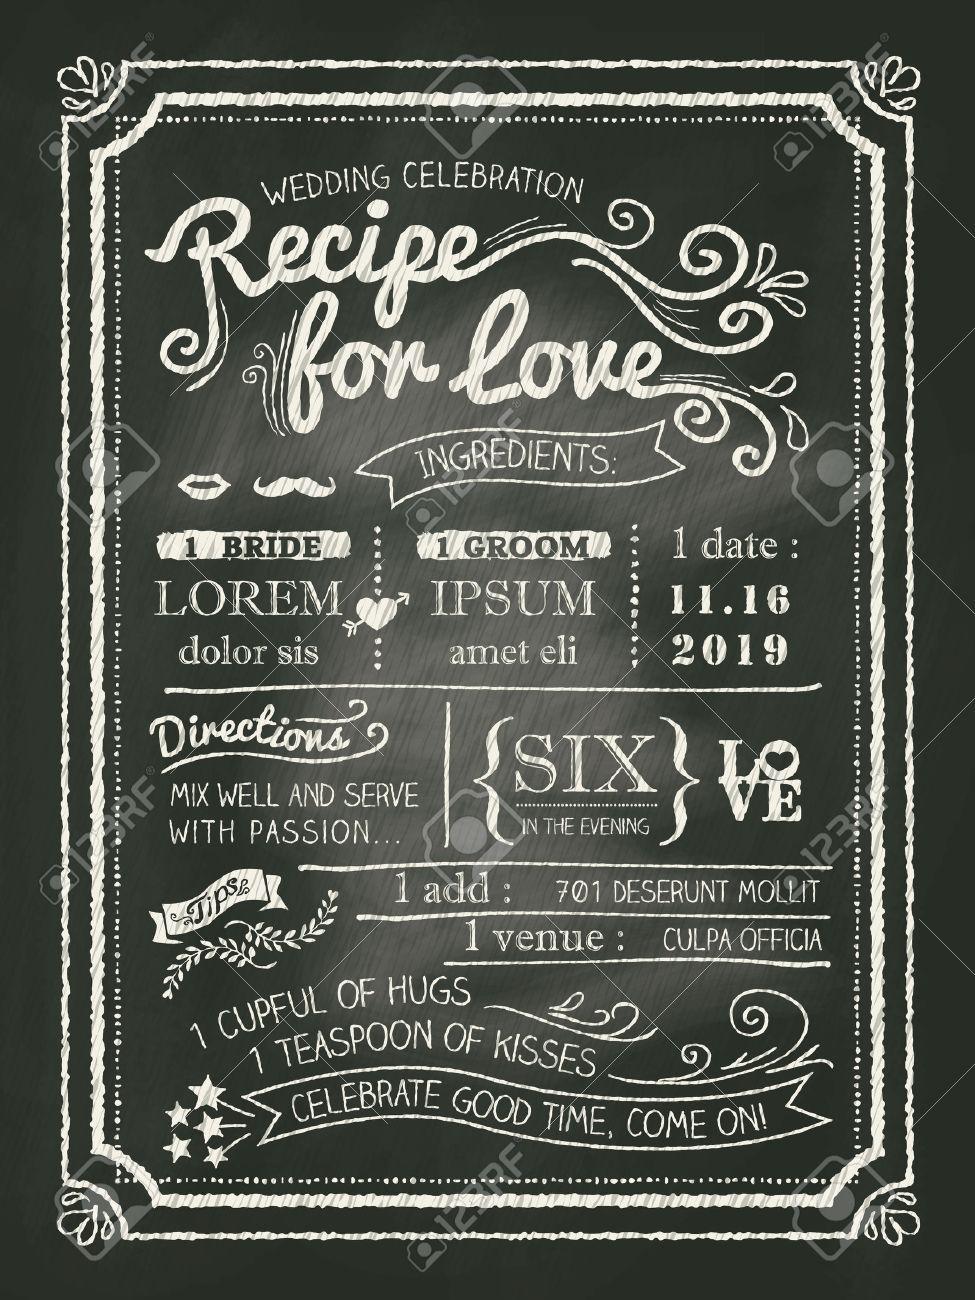 Recipe chalkboard wedding invitation card background royalty free recipe chalkboard wedding invitation card background stock vector 28919230 filmwisefo Choice Image